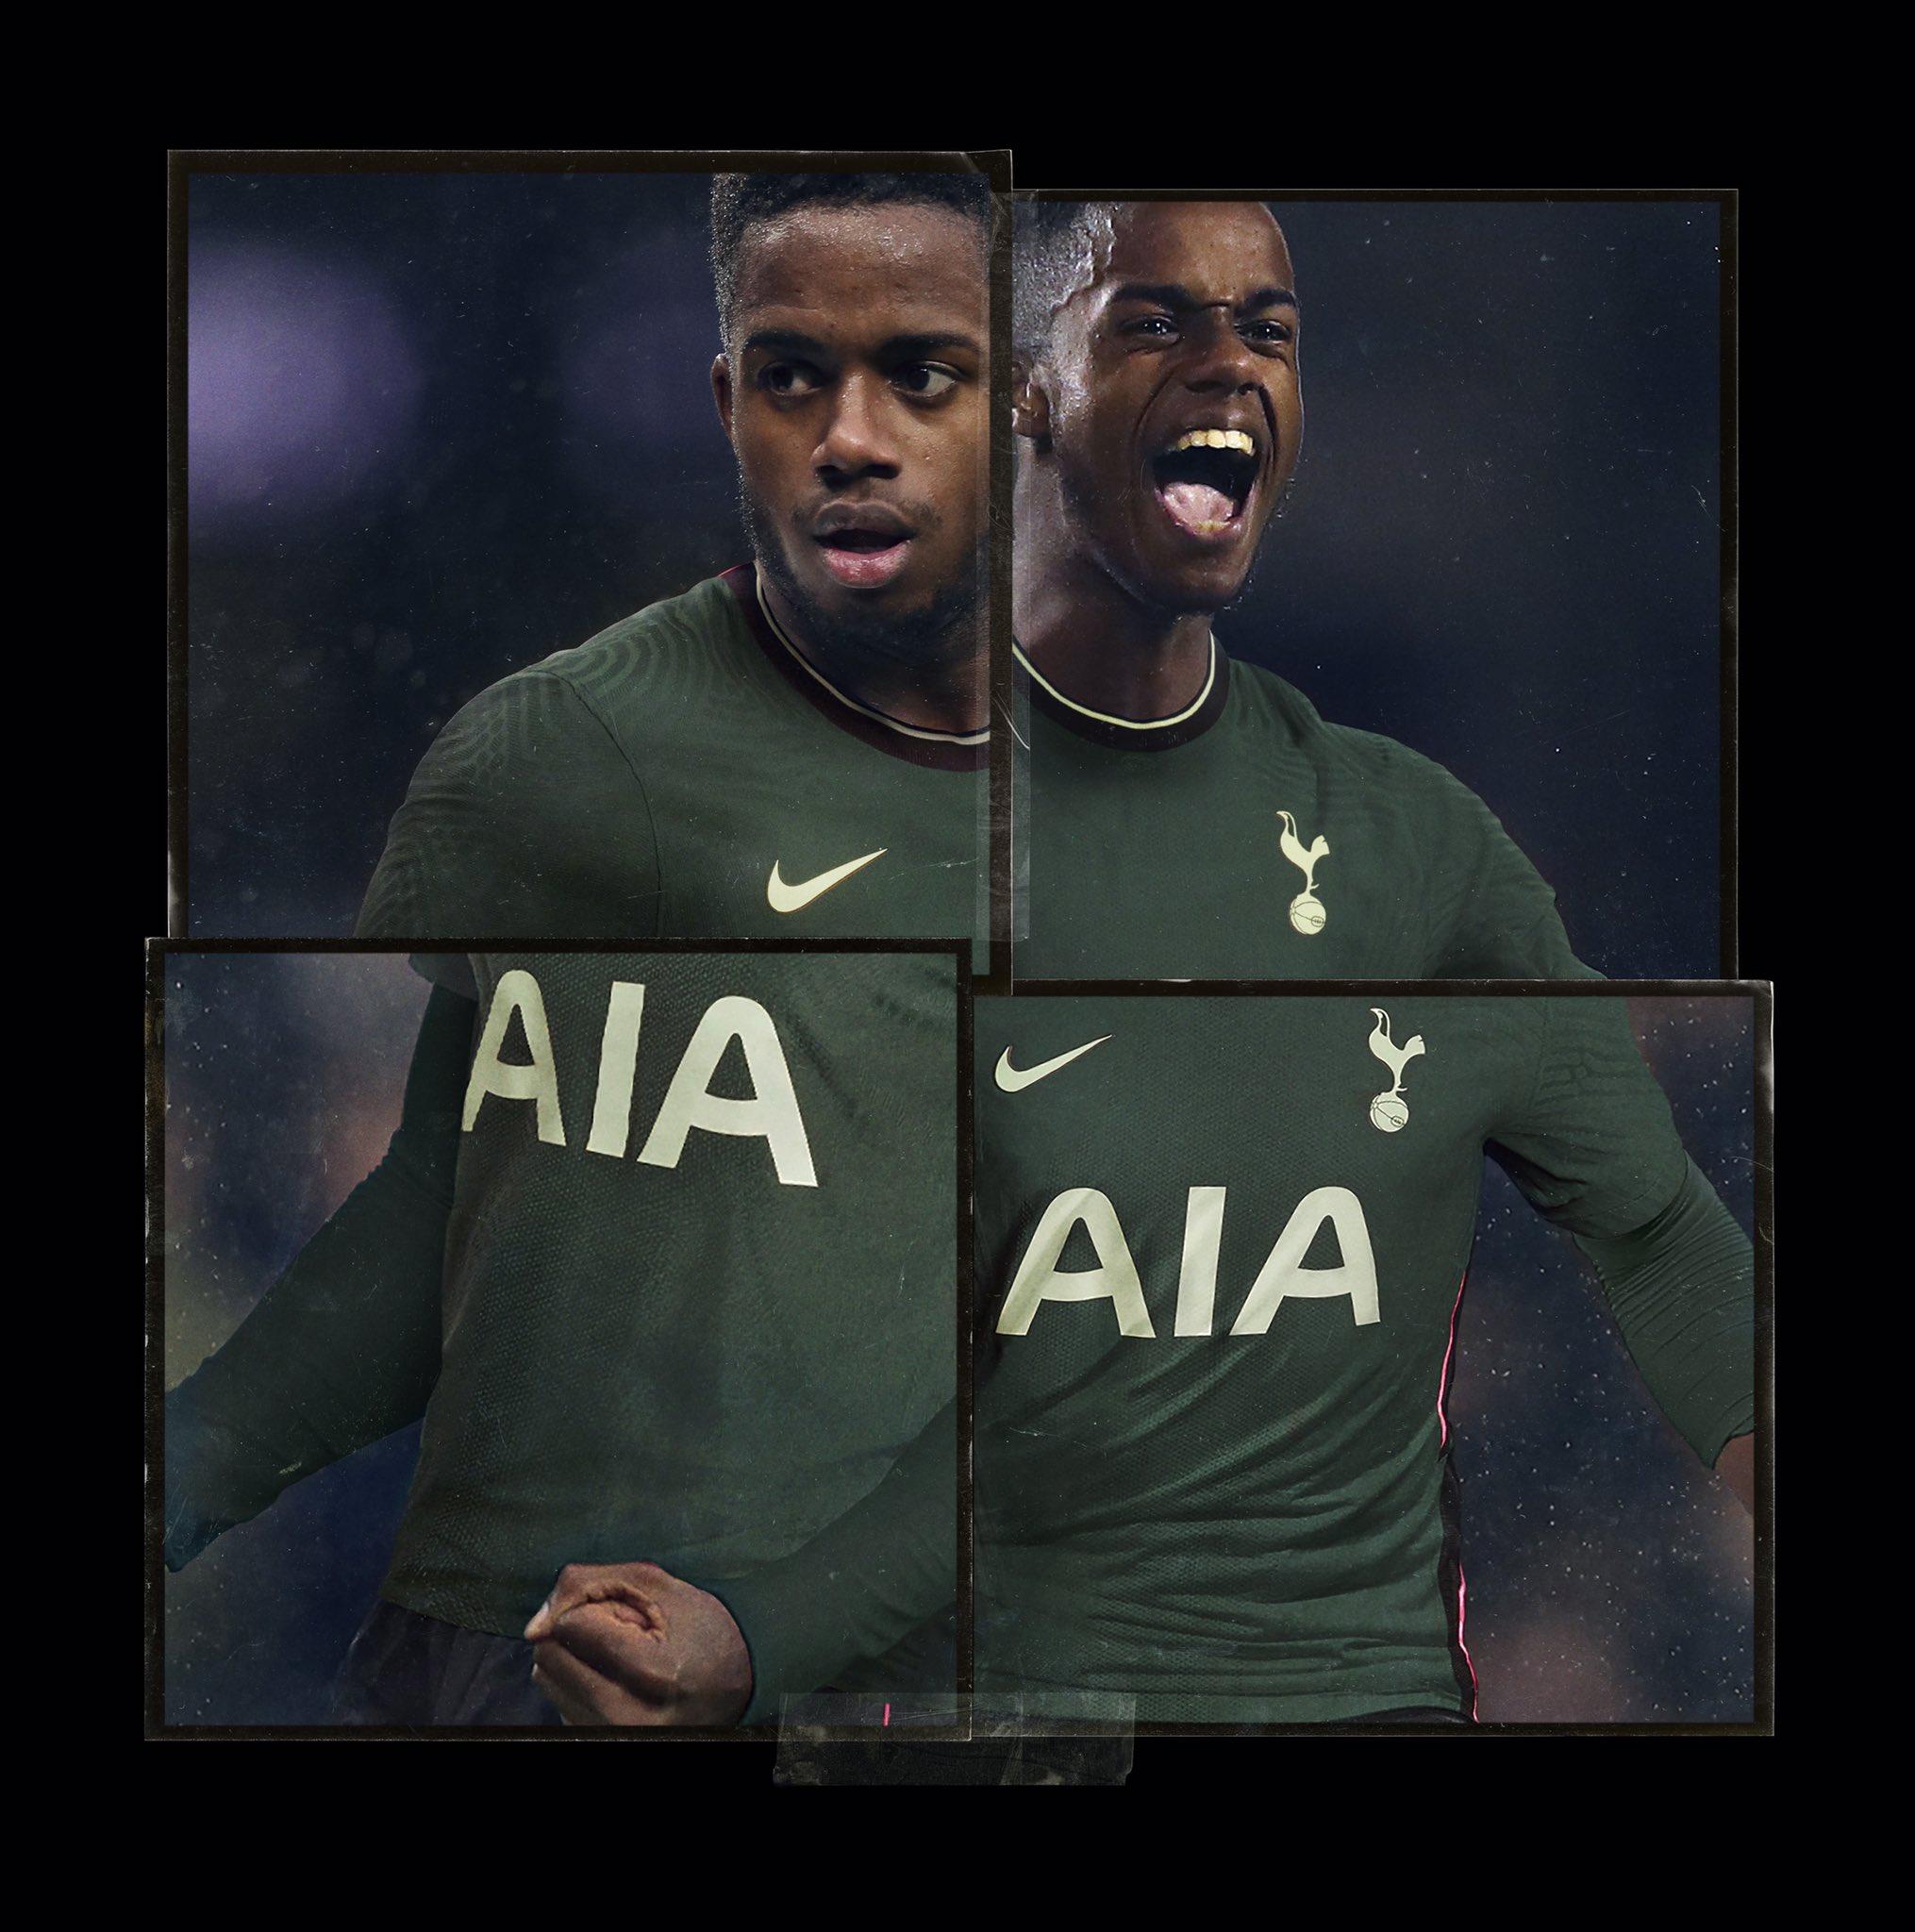 Tottenham 2020 2021 maillot exterieur football Nike